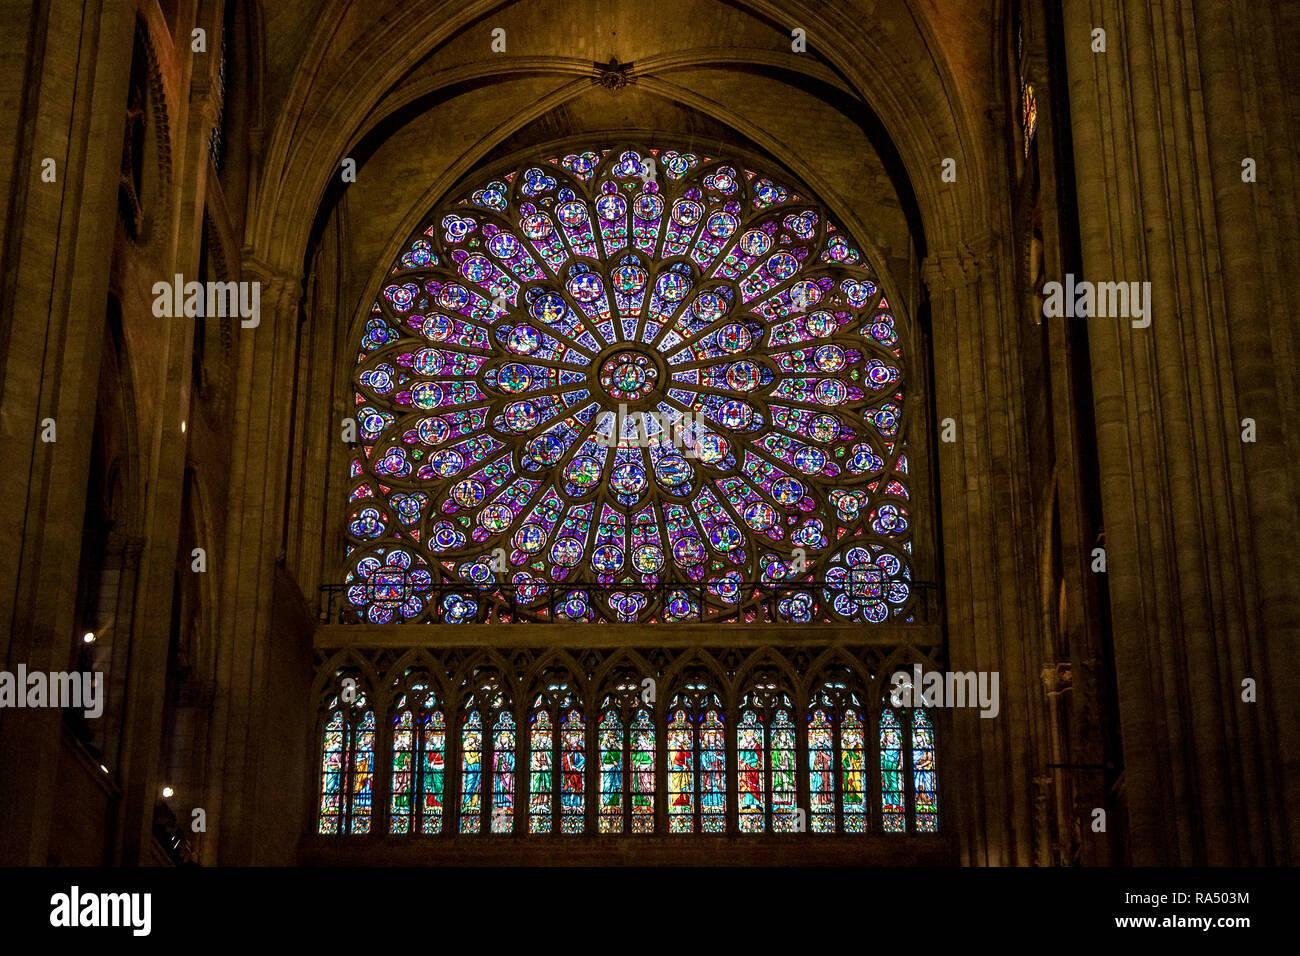 The North rose window of Notre-Dame de Paris also known as Notre Dame Cathedral a medieval Catholic cathedral on the Île de la Cité - Stock Image